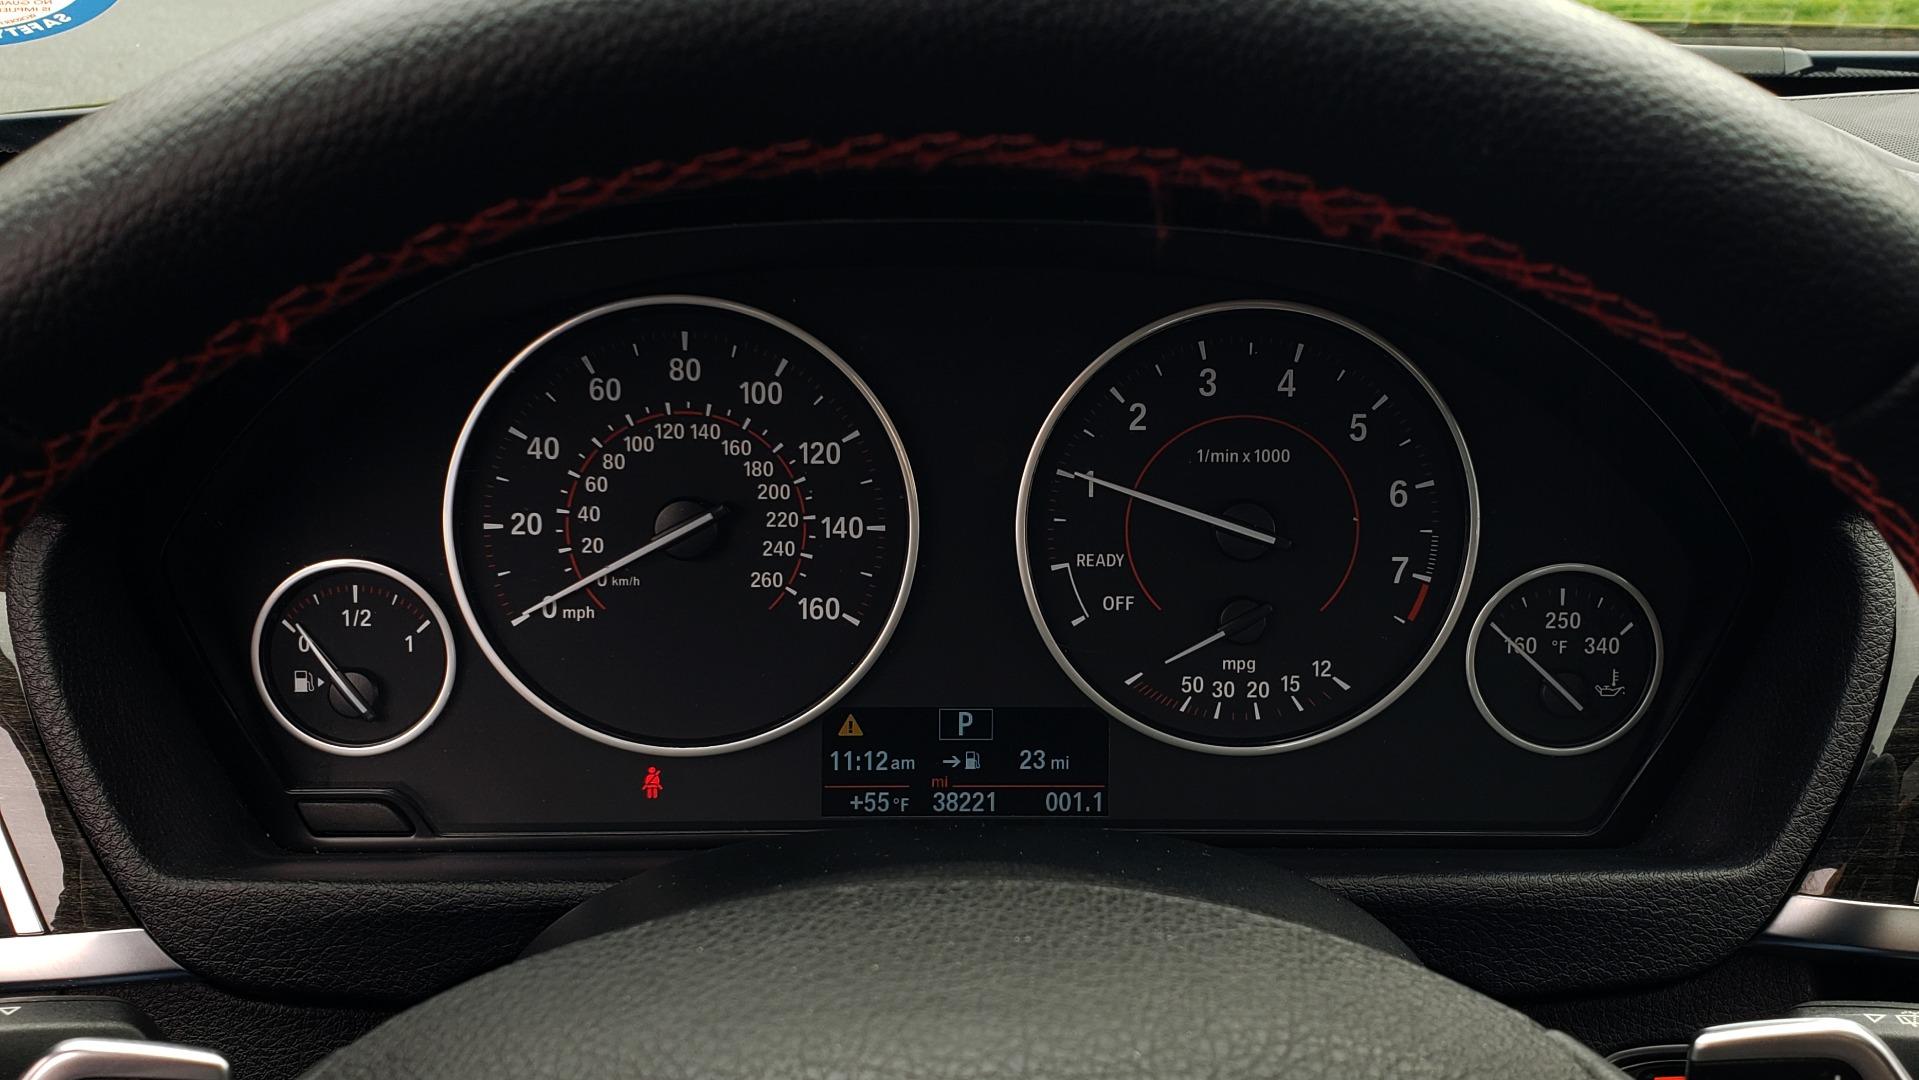 Used 2016 BMW 3 SERIES 328I PREMIUM PKG / DRVR ASST / SUNROOF / PARK ASST for sale Sold at Formula Imports in Charlotte NC 28227 38